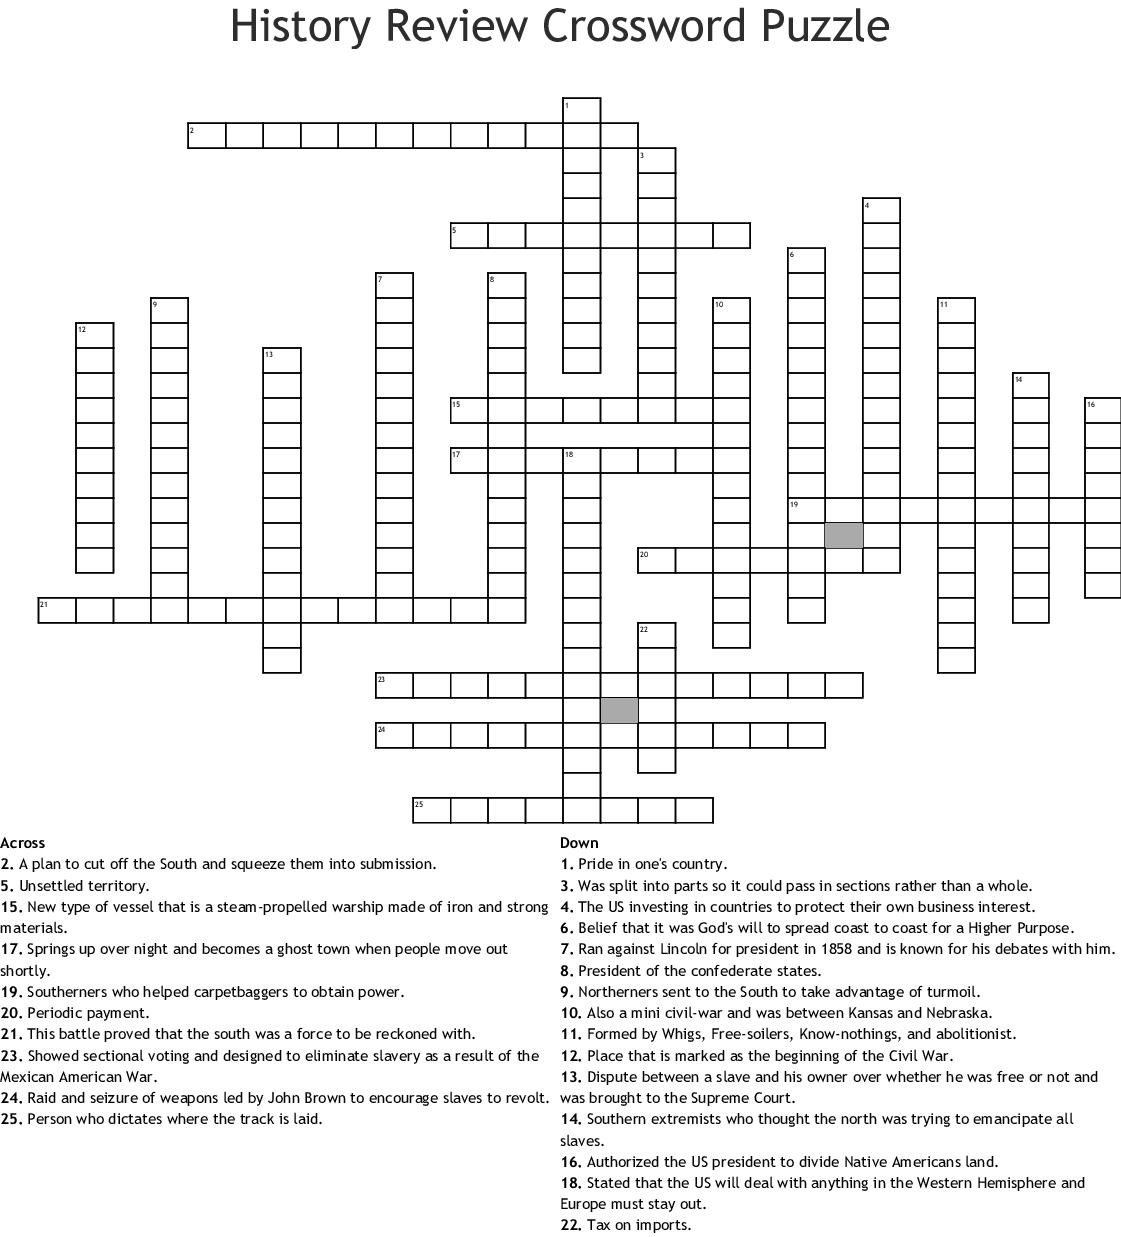 History Review Crossword Puzzle Crossword